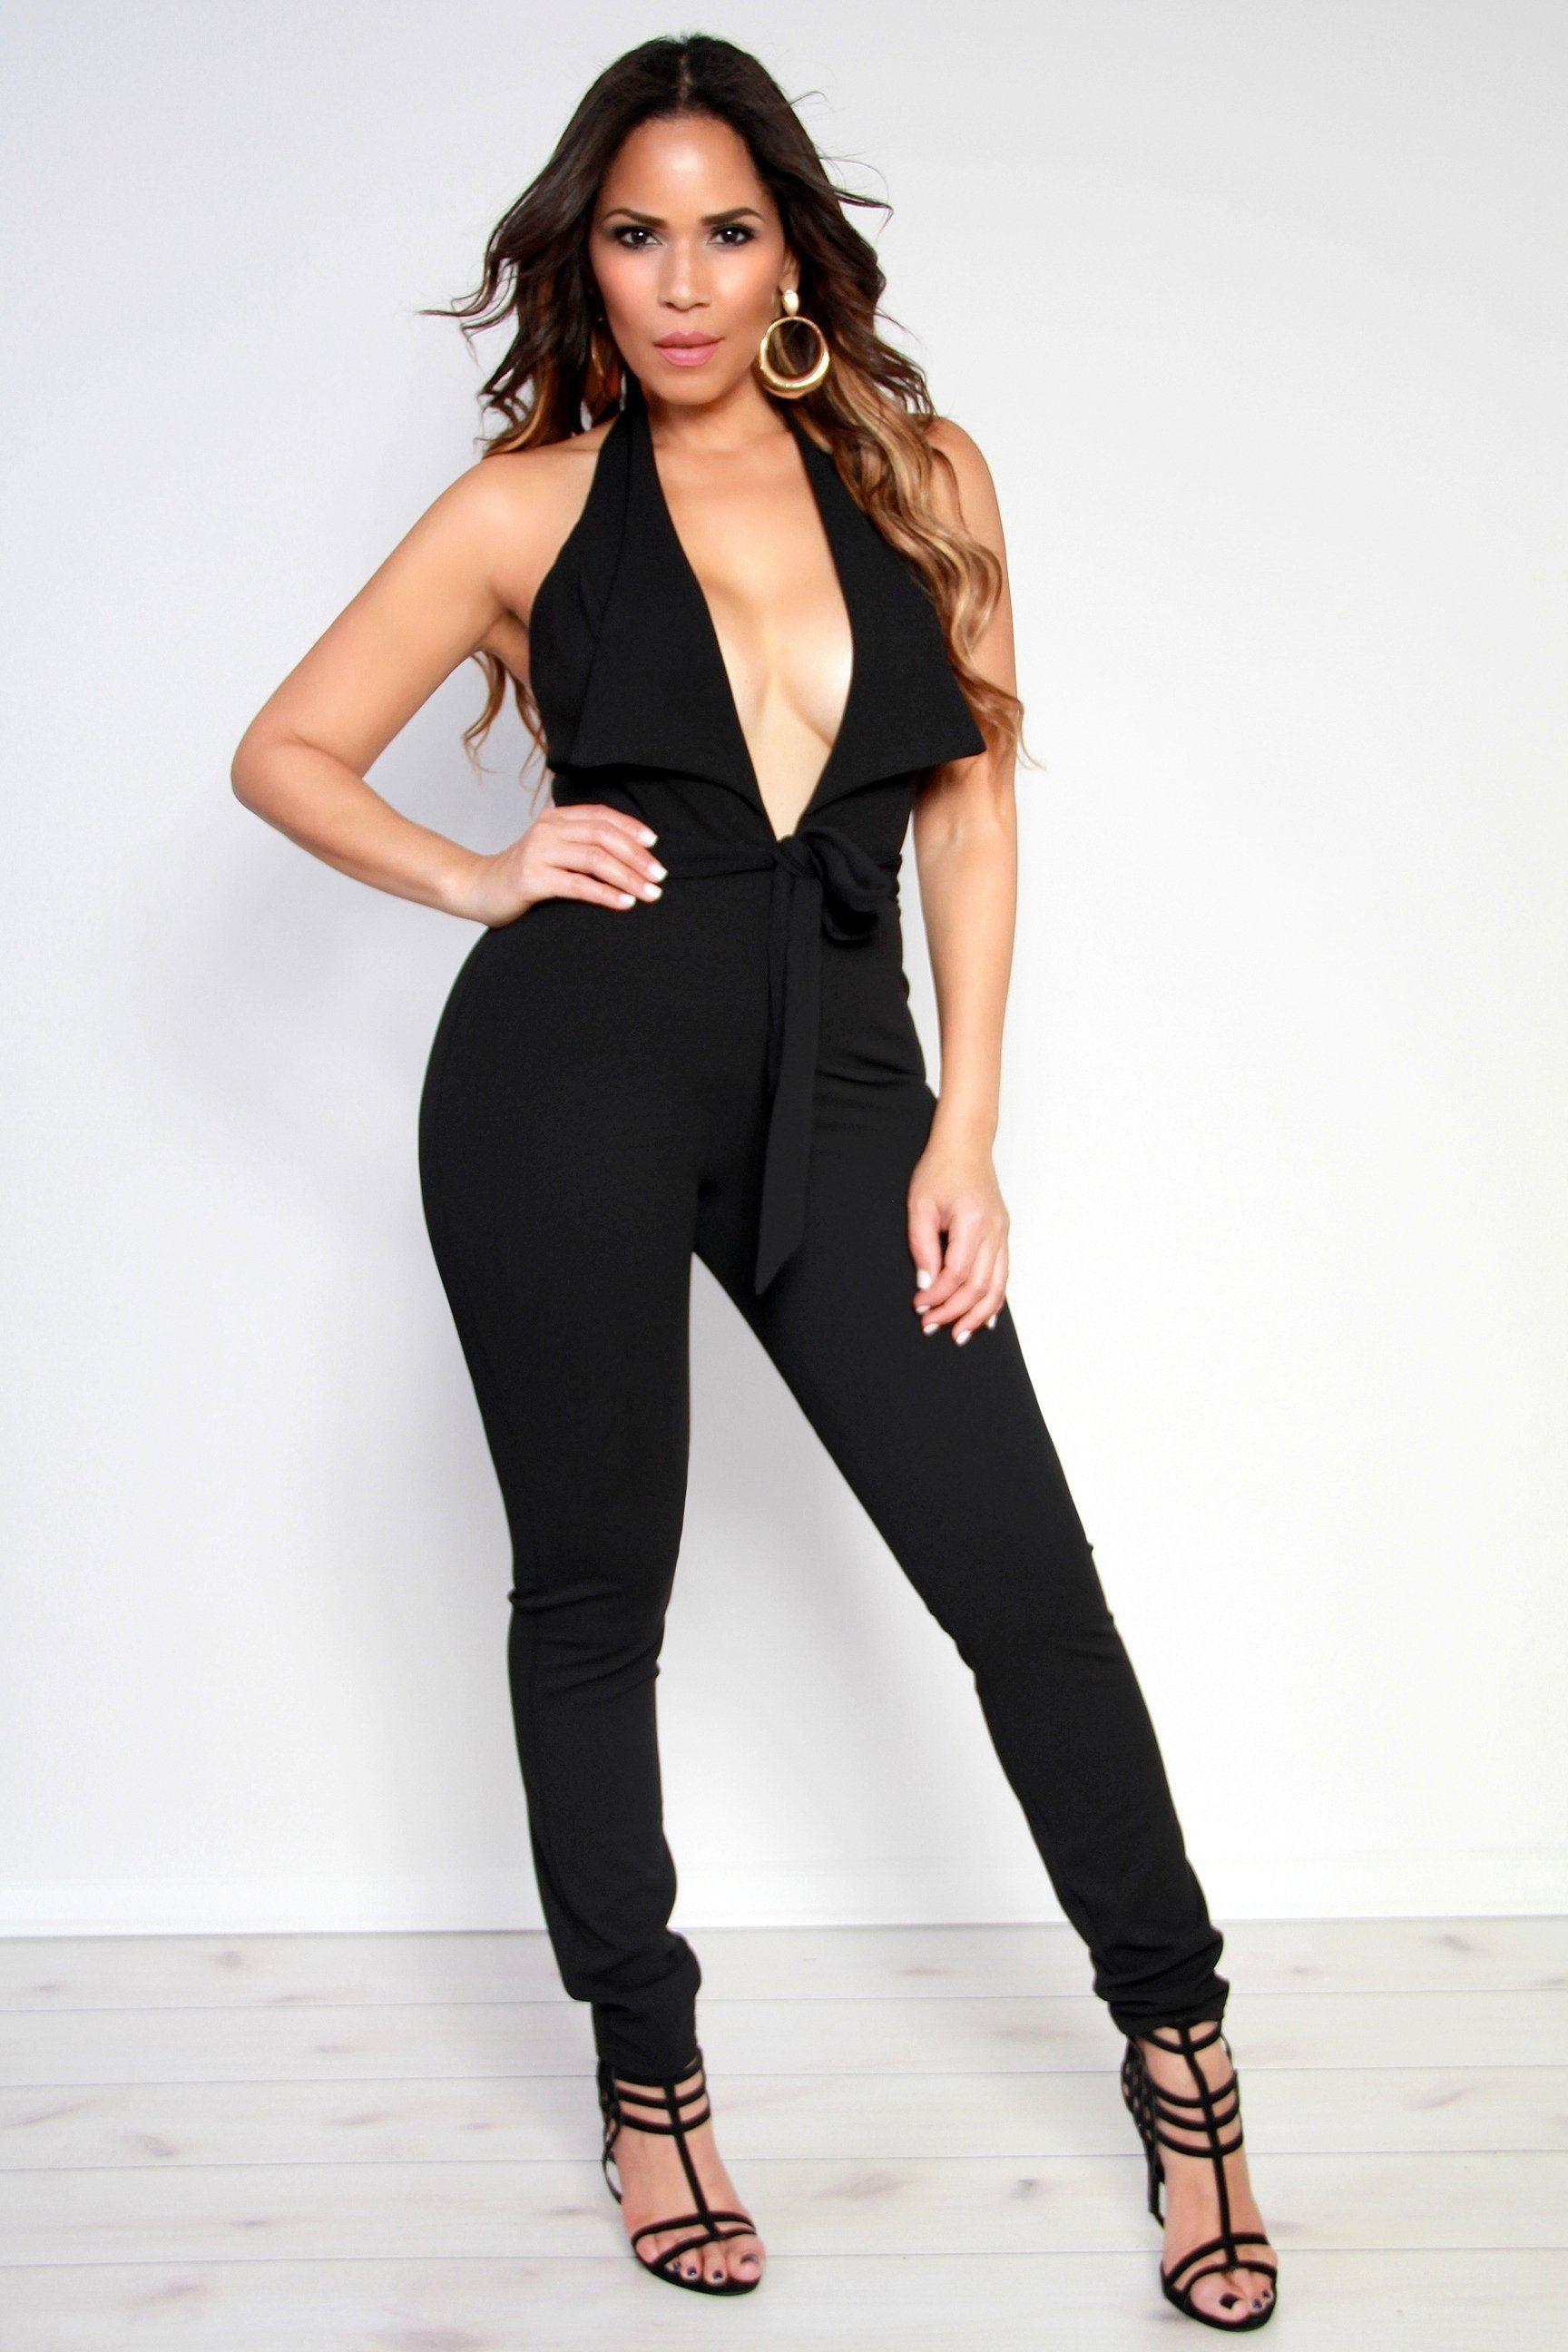 d5fcbd3c350 Tux Halter Top Plunging V-Neck Jumpsuit W  Waist Tie In Black – MY SEXY  STYLES